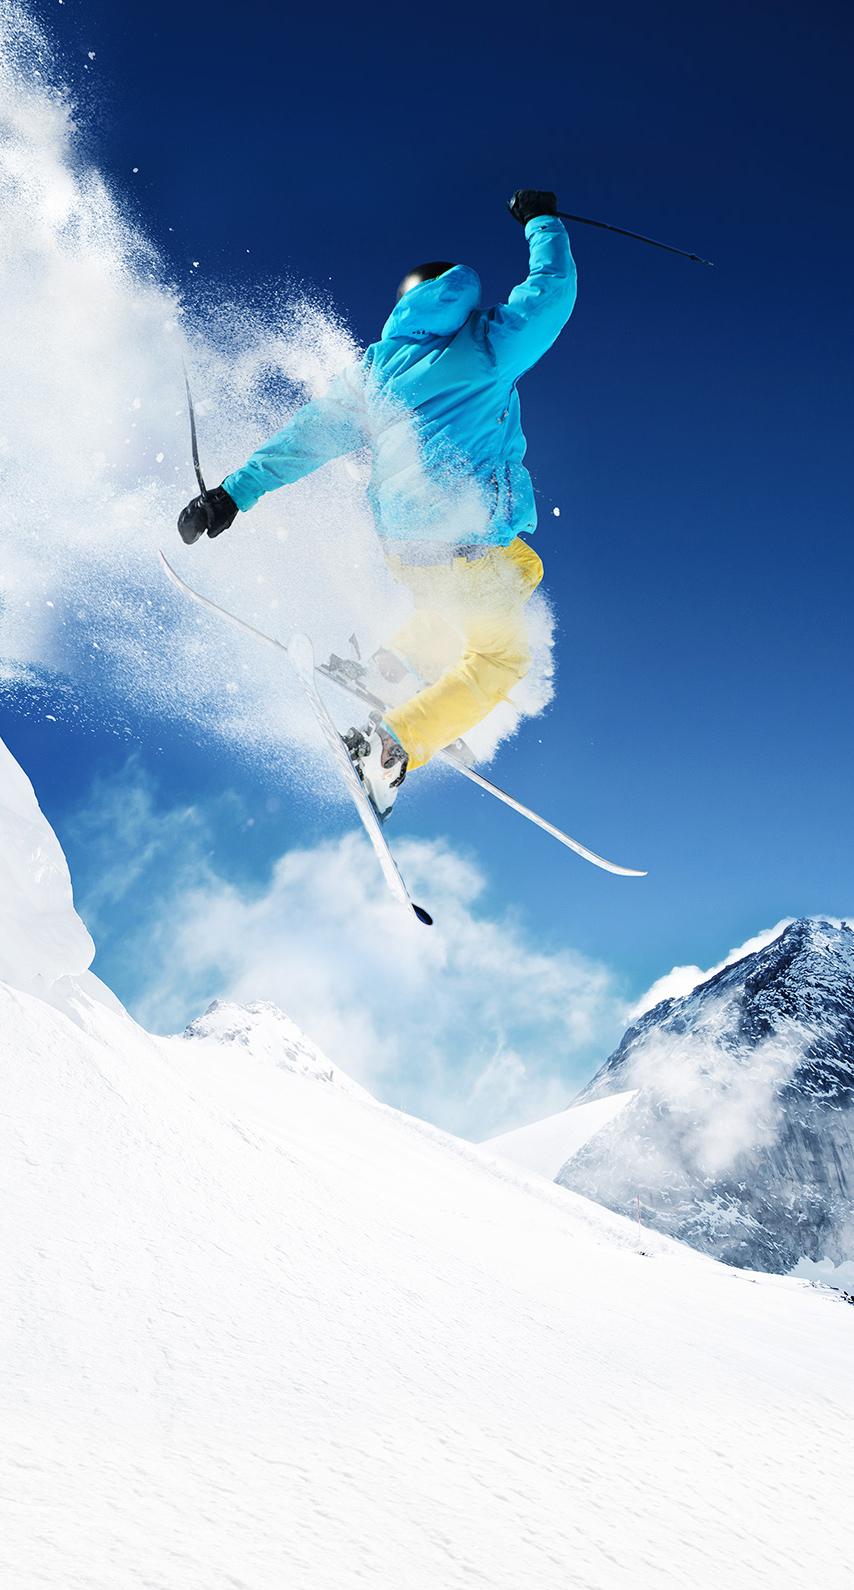 soccer, mountain, man, outdoors, high, recreation, action, sport, cold, snowboard, mountain peak